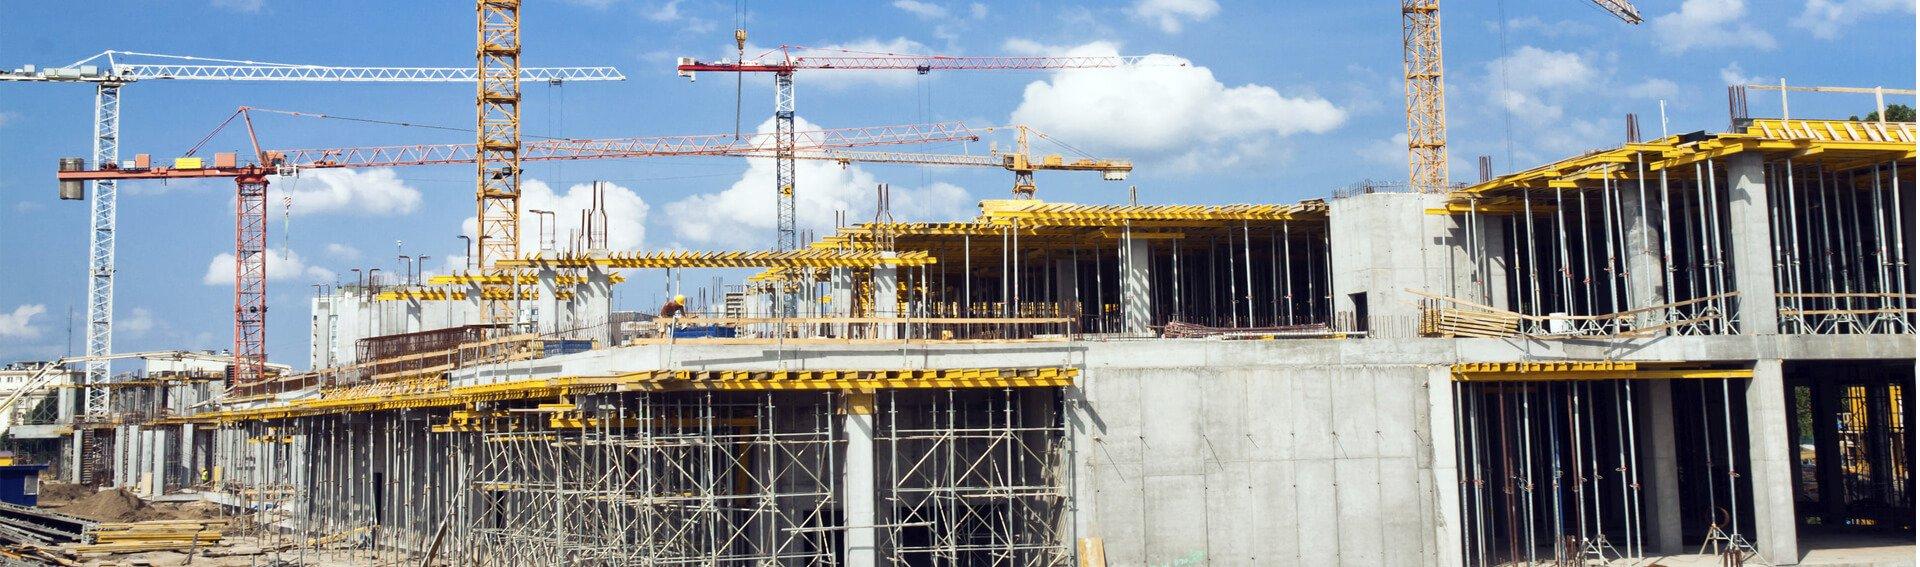 industrial engineering design consultants in India